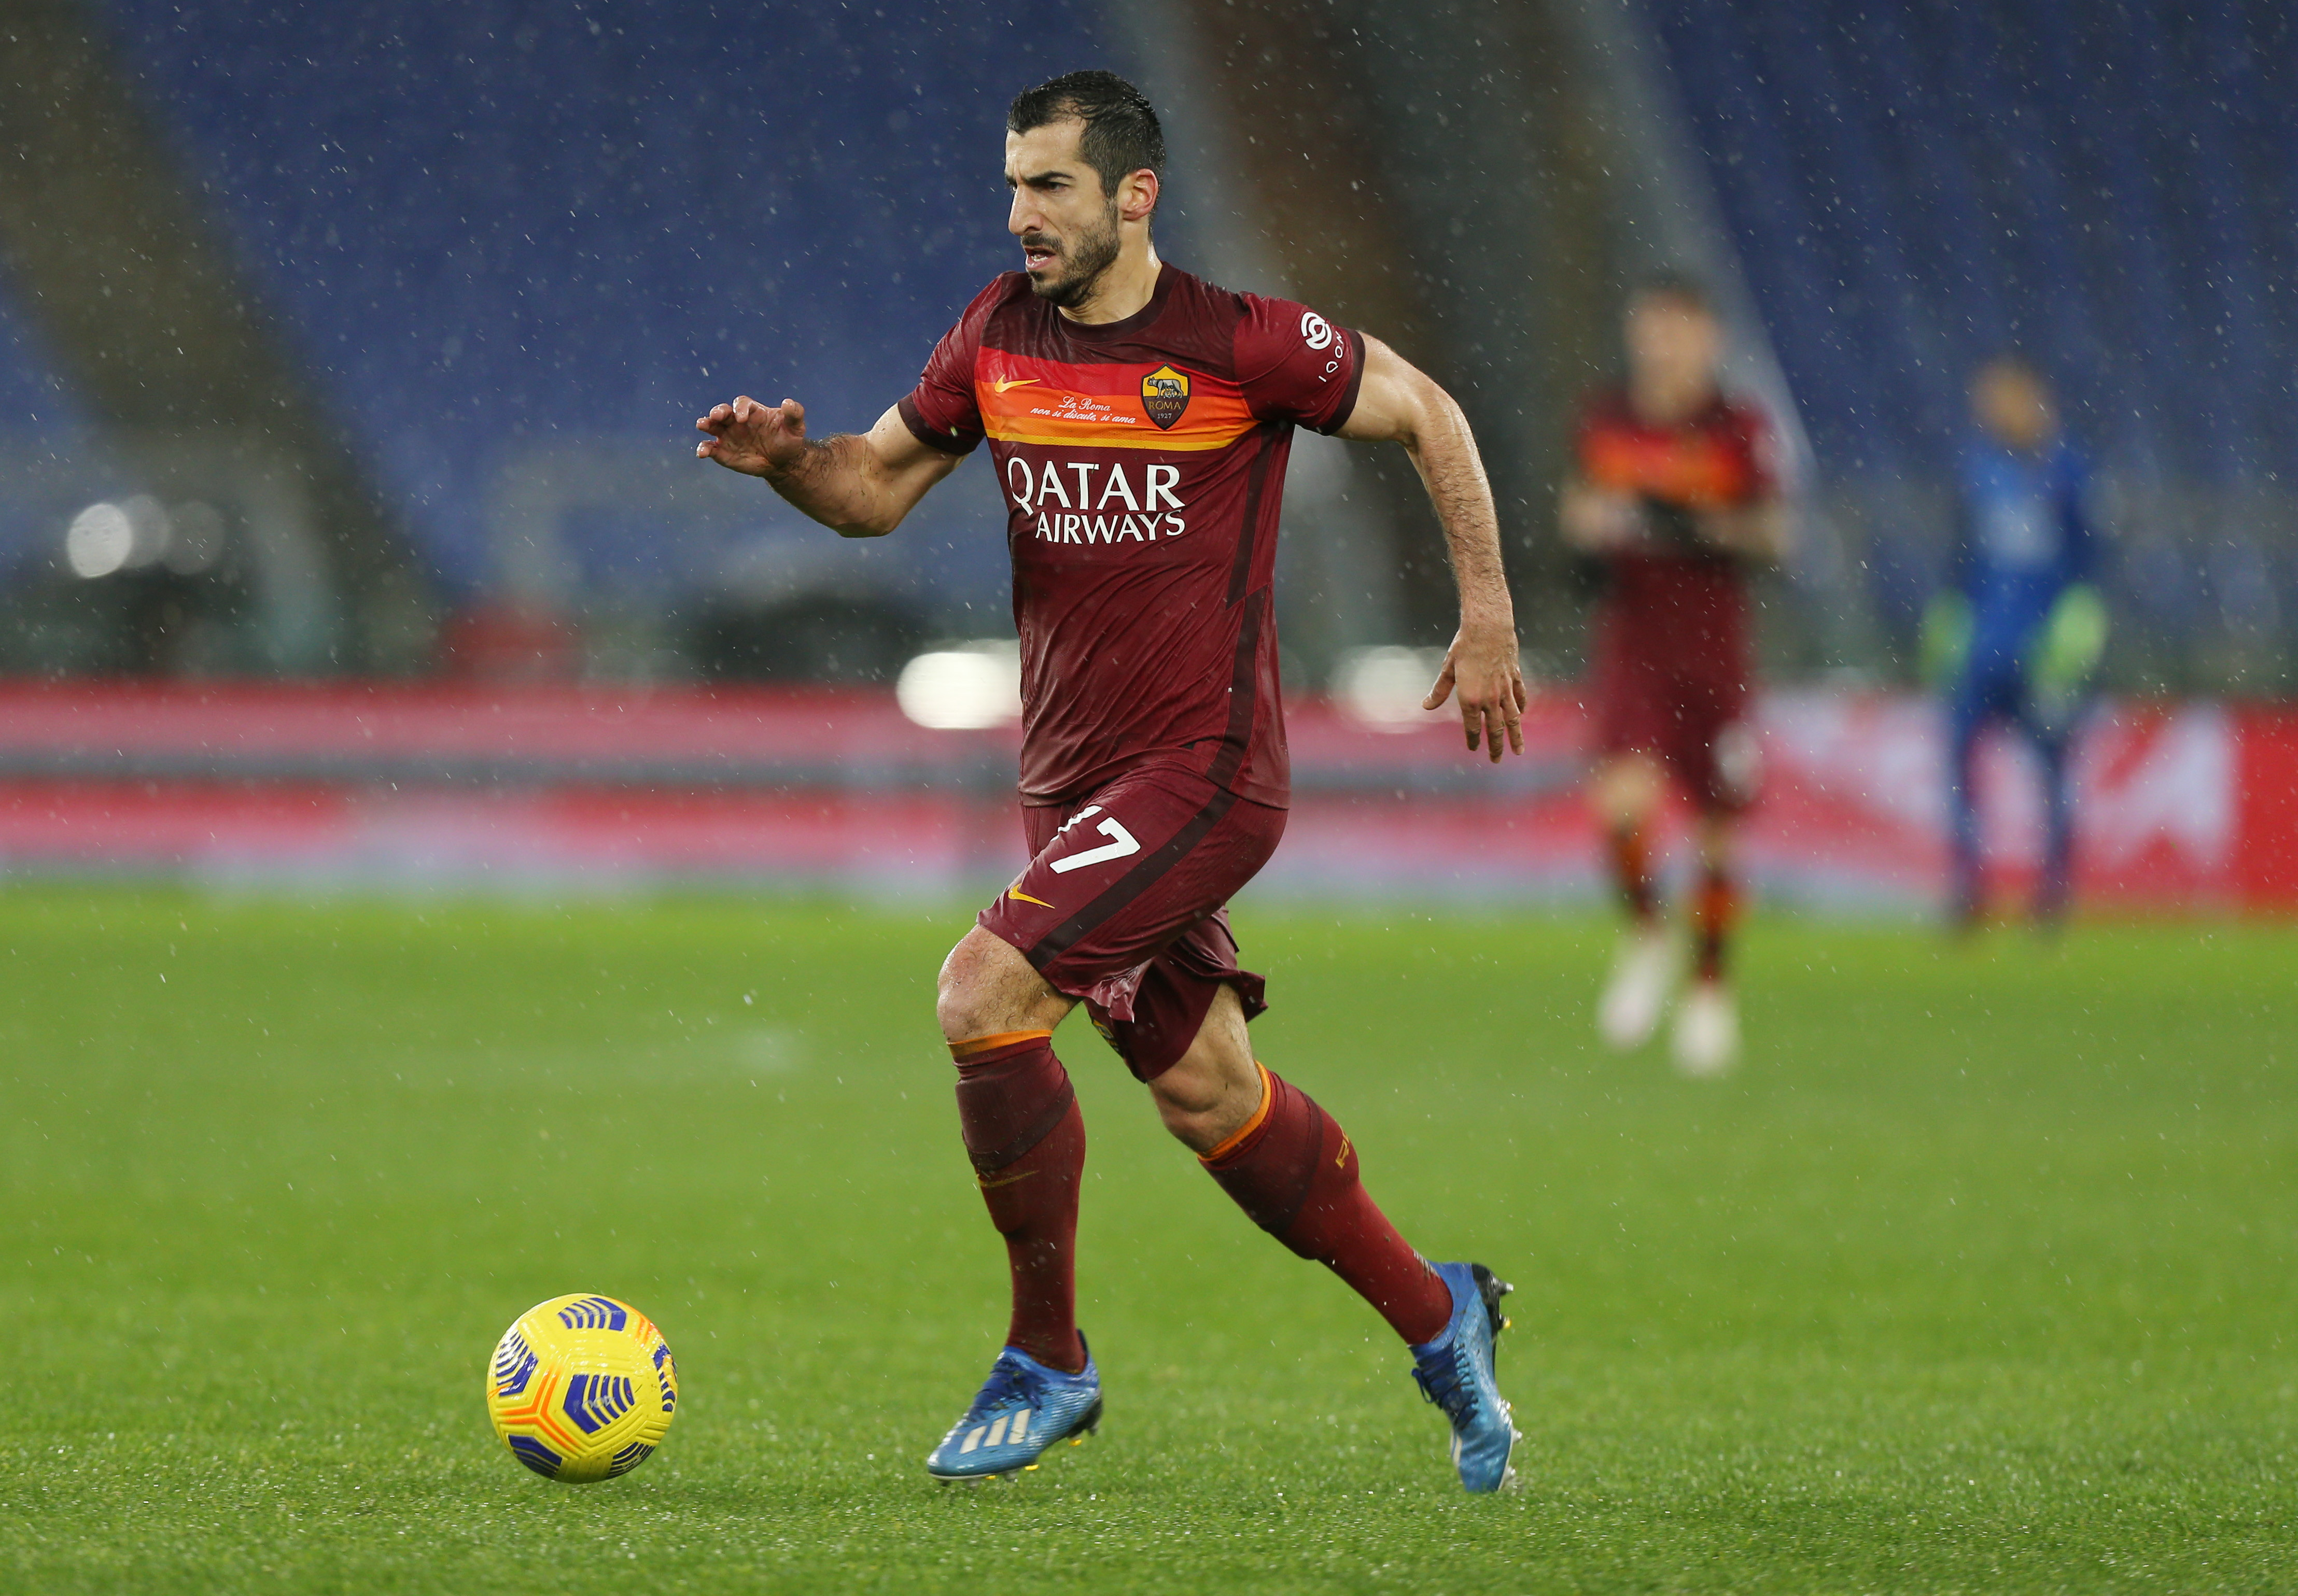 5) Mkhitaryan (Roma): ha partecipato a 18 gol, 9 gol e 9 assist